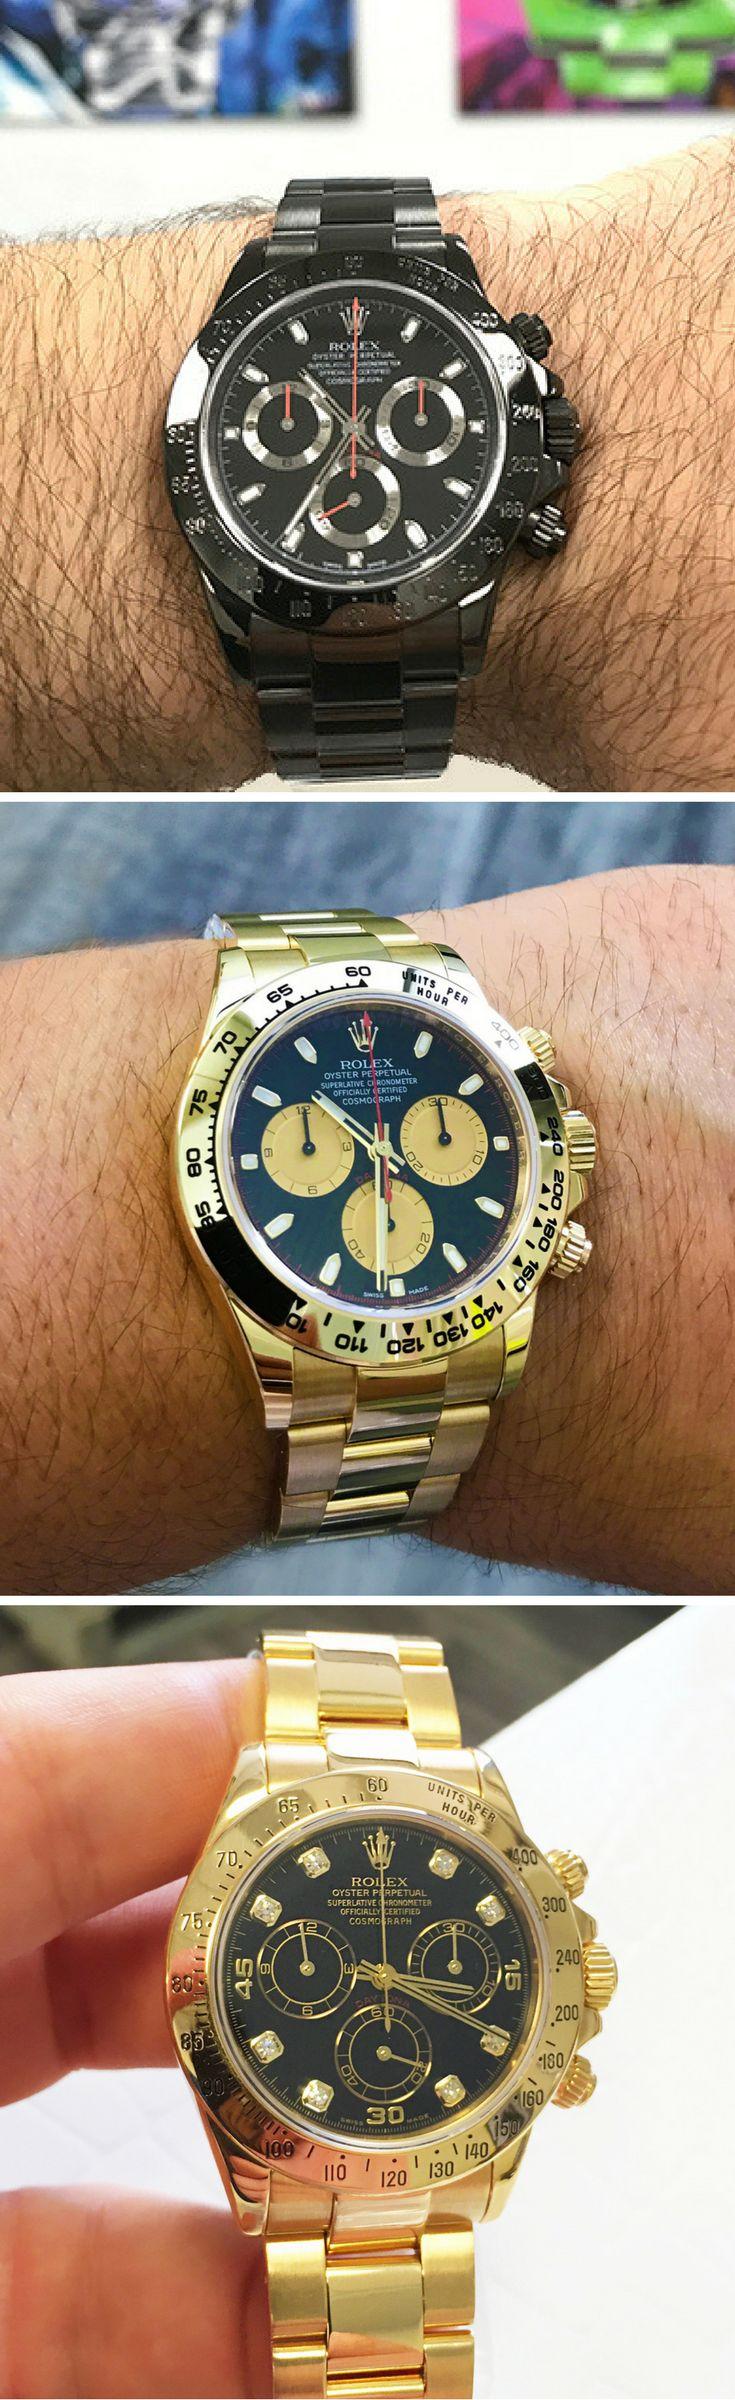 Rolex Daytona Chronograph Trilogy DLC-PVD, Gold Panda Dial, Gold & Diamond Dial, Watch Showcase For Men Living That Luxury Lifestyle